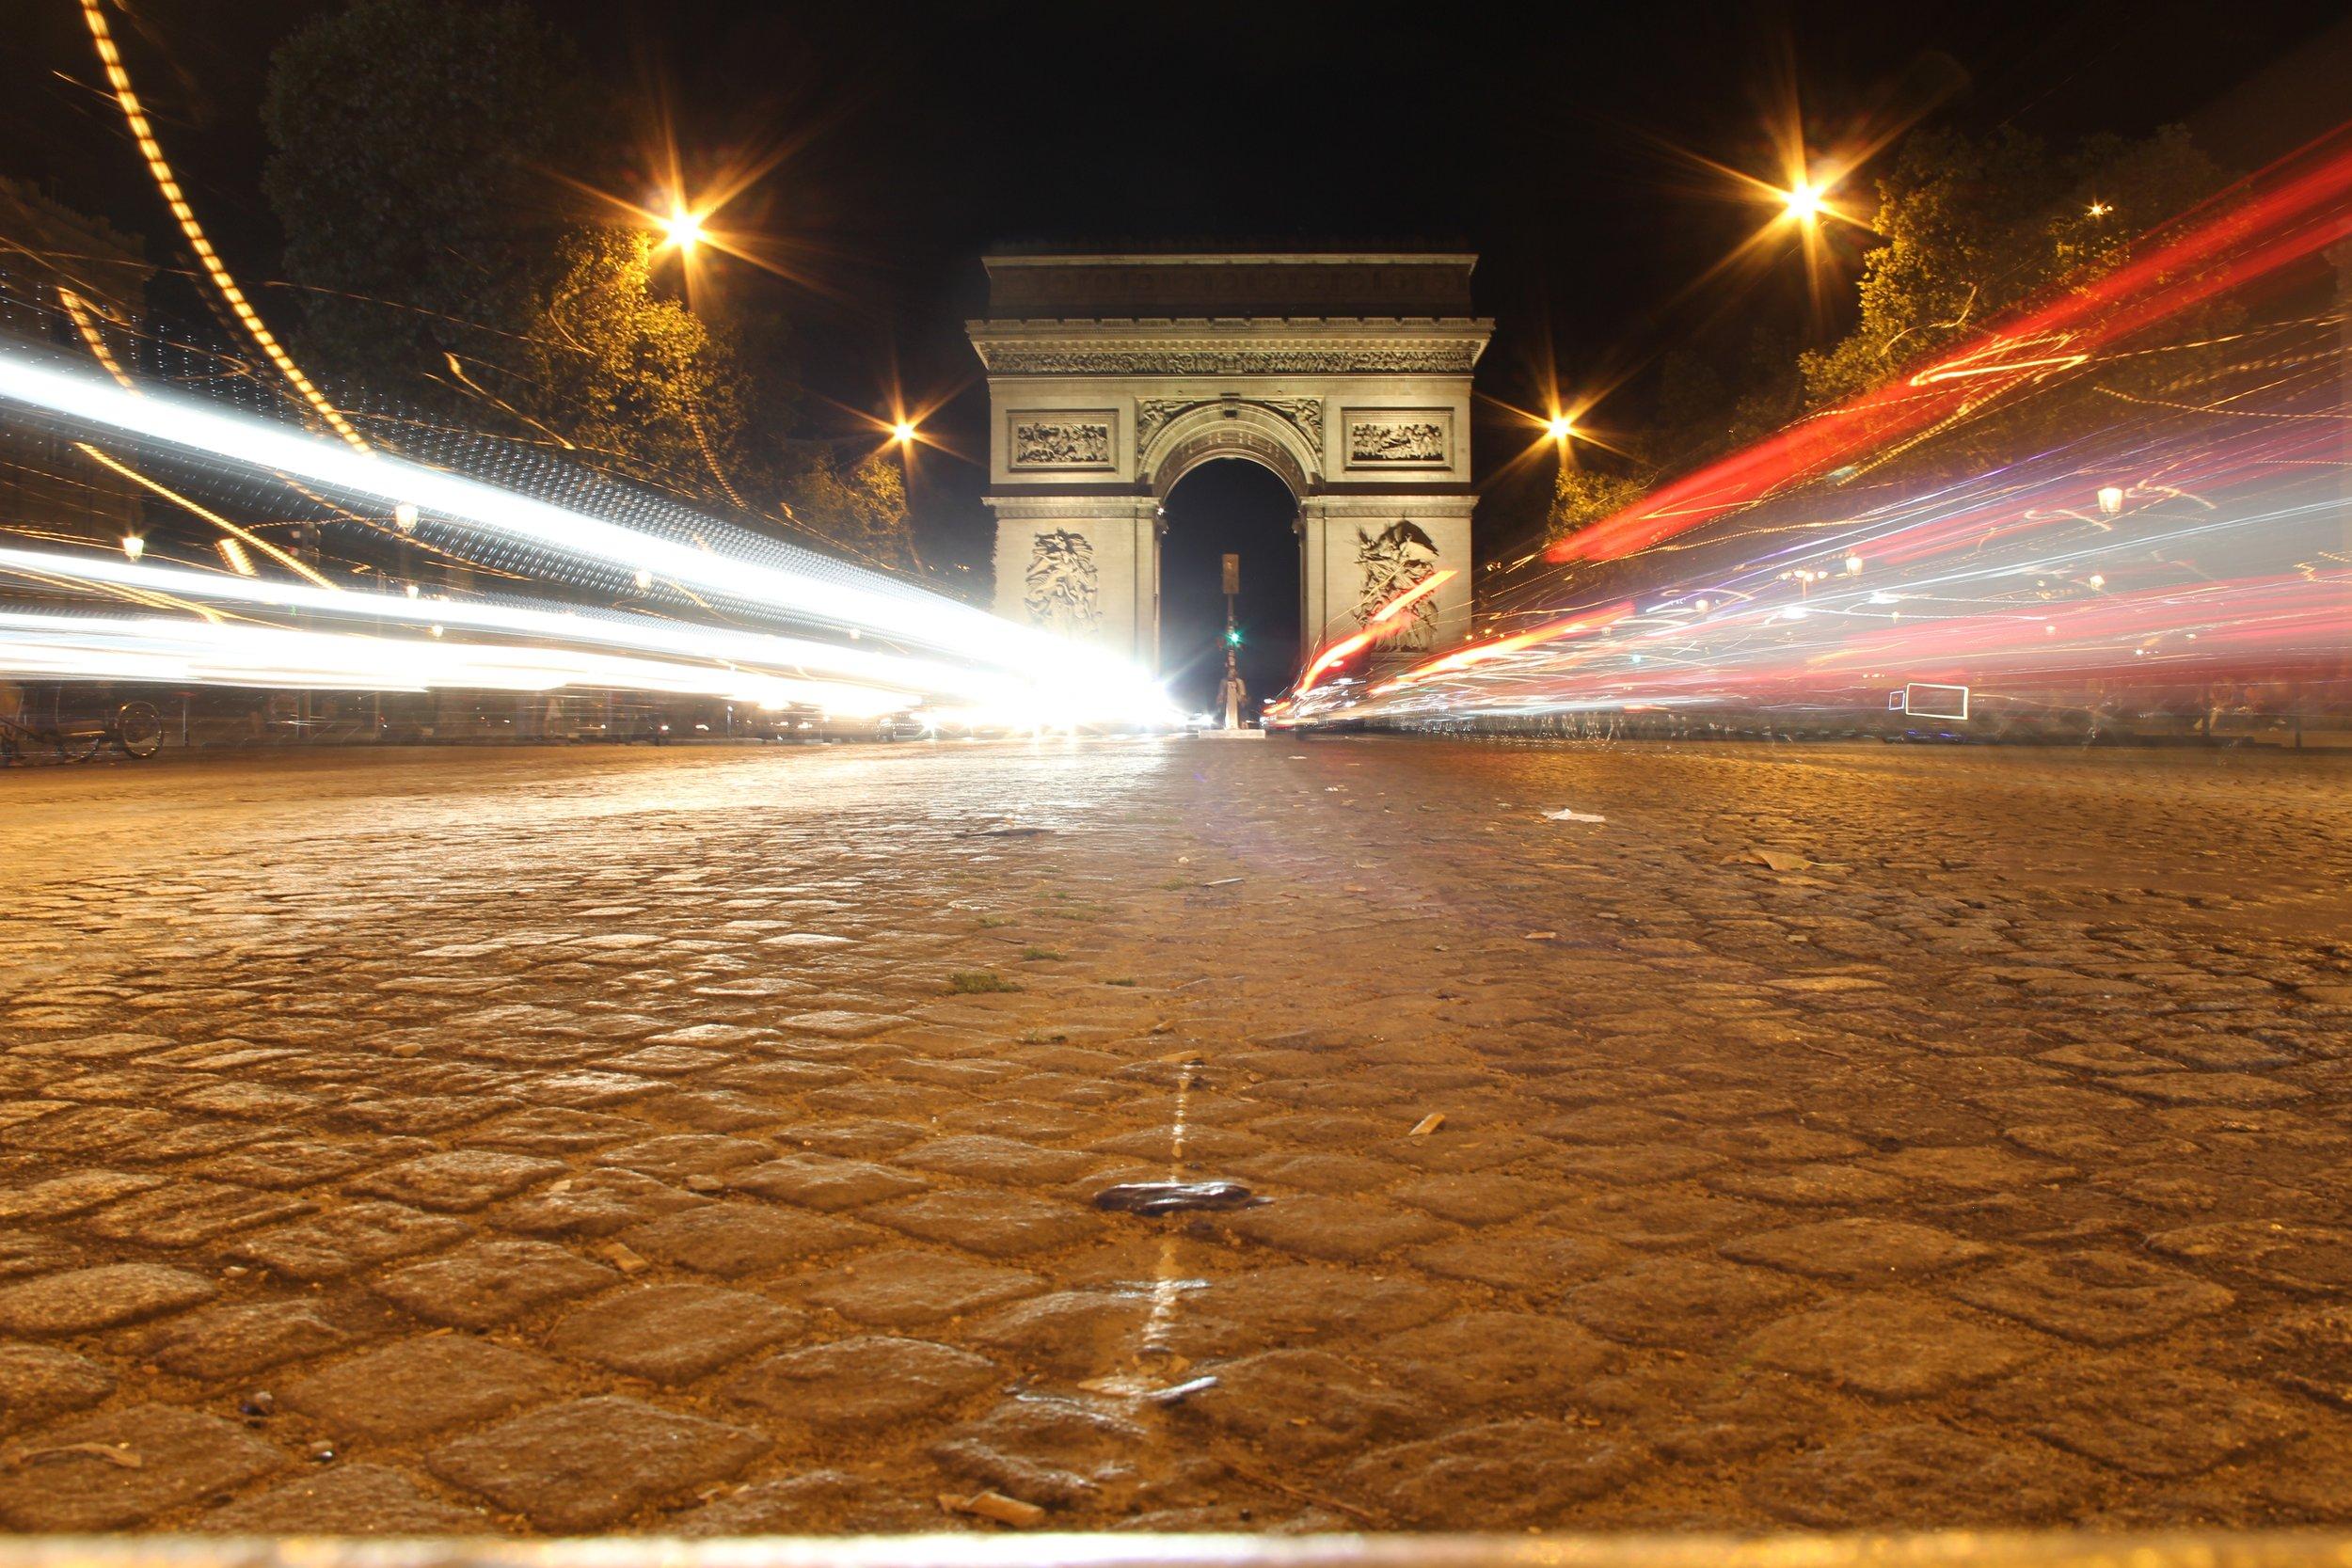 2016.09 Paris Edited 8486.jpg